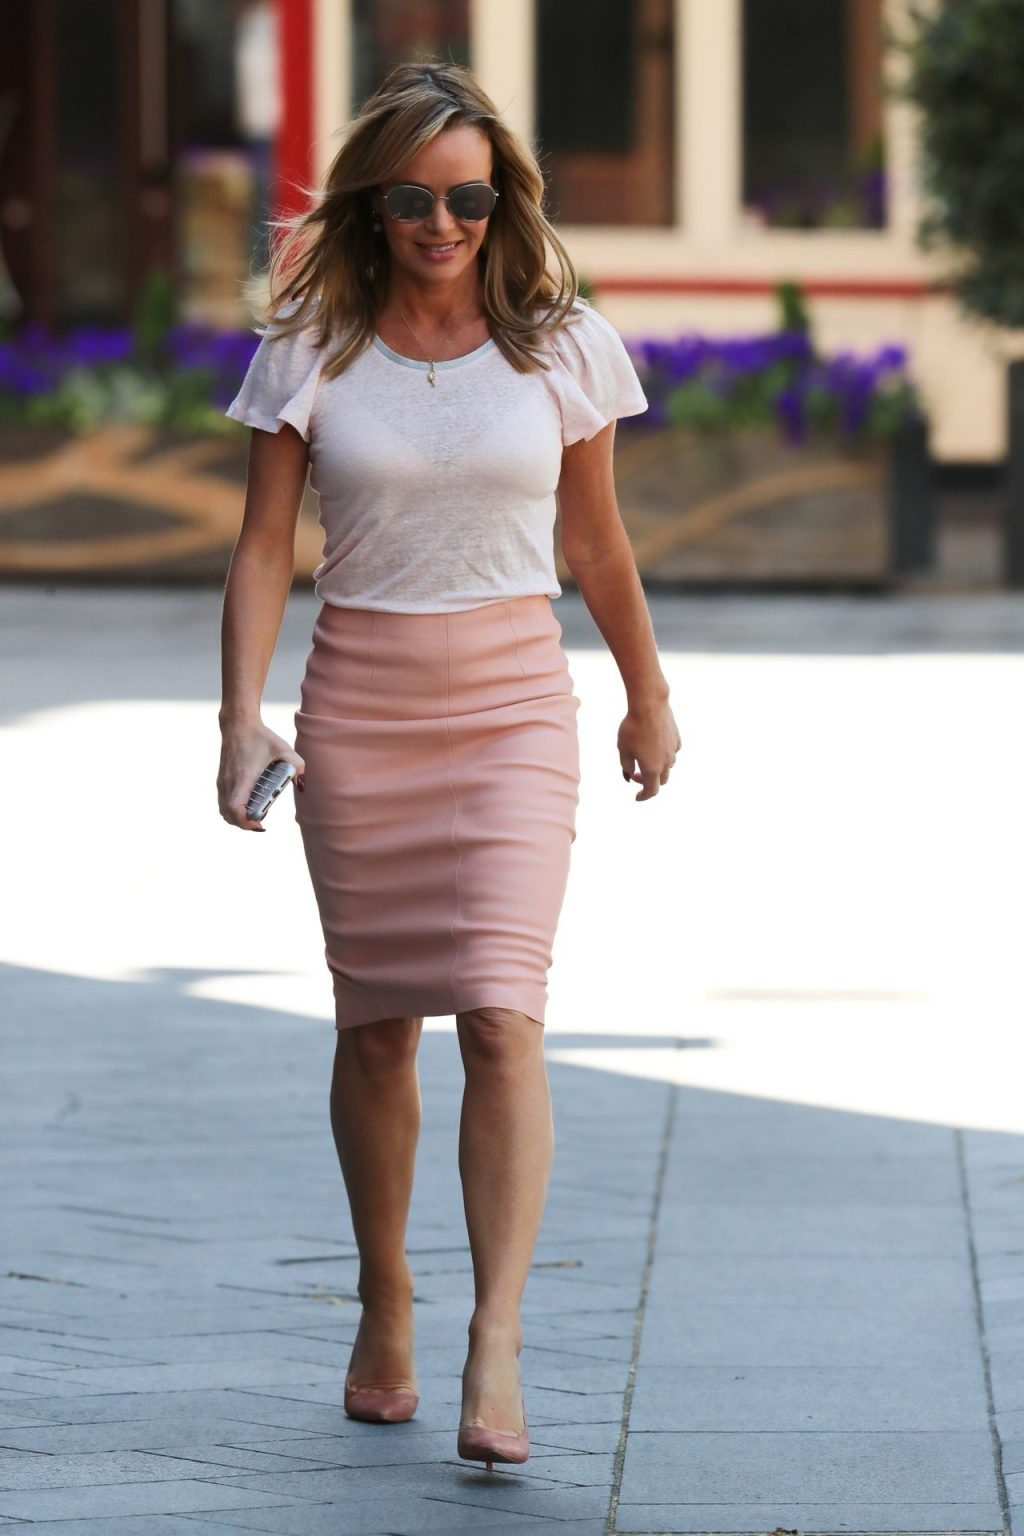 Amanda Holden Was Pictured Leaving the Heart Radio Studios (19 Photos)